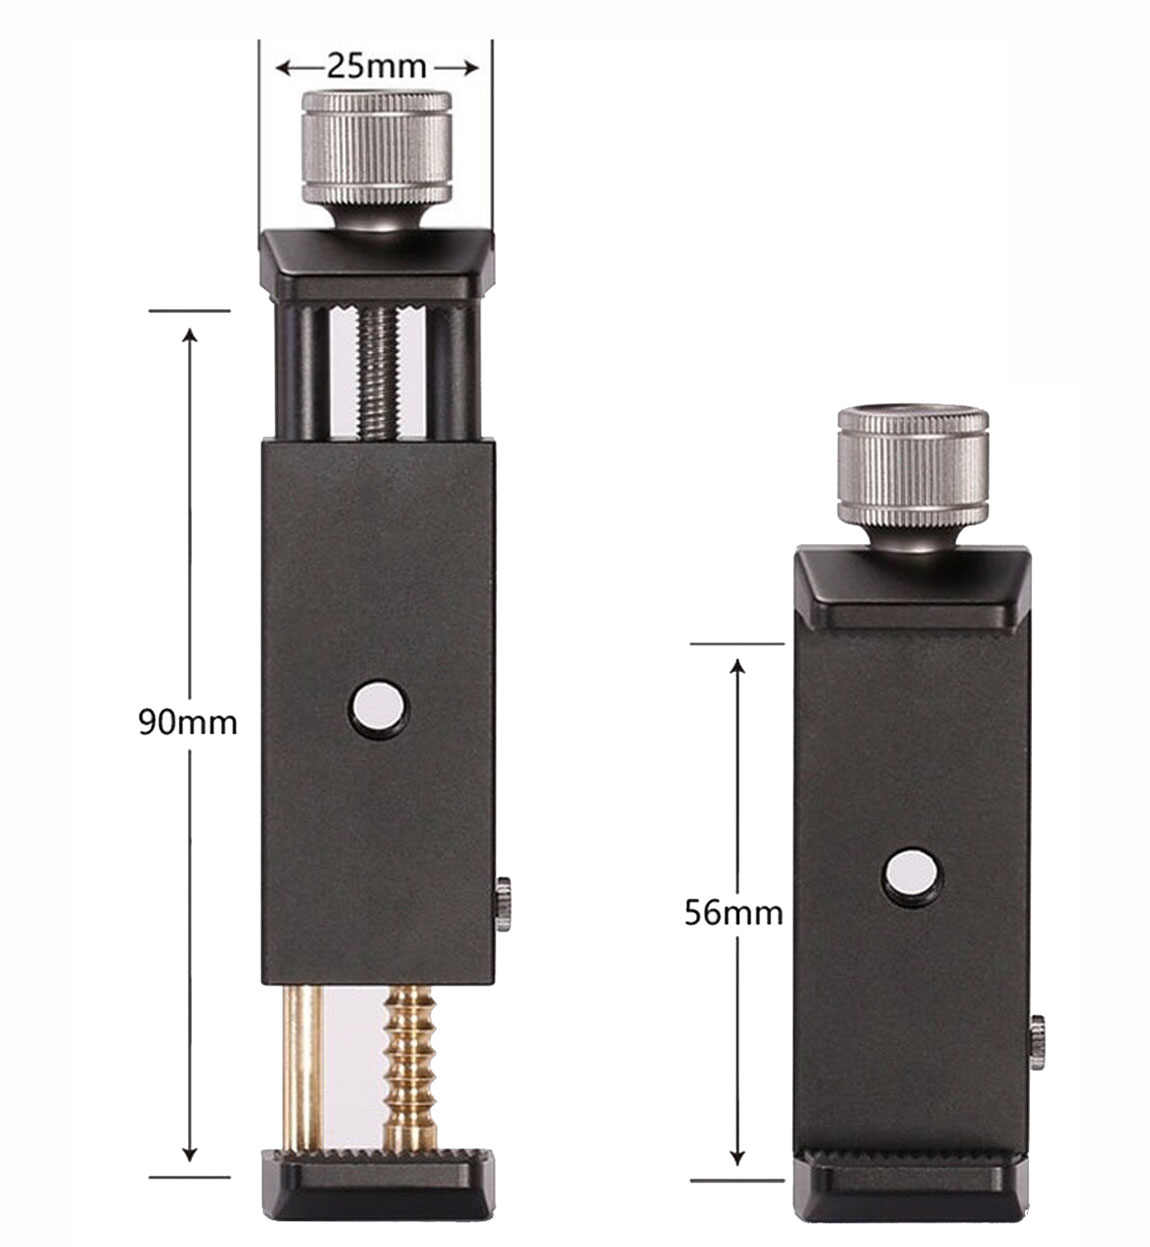 Leofoto PC-90 pinza universal para smartphones